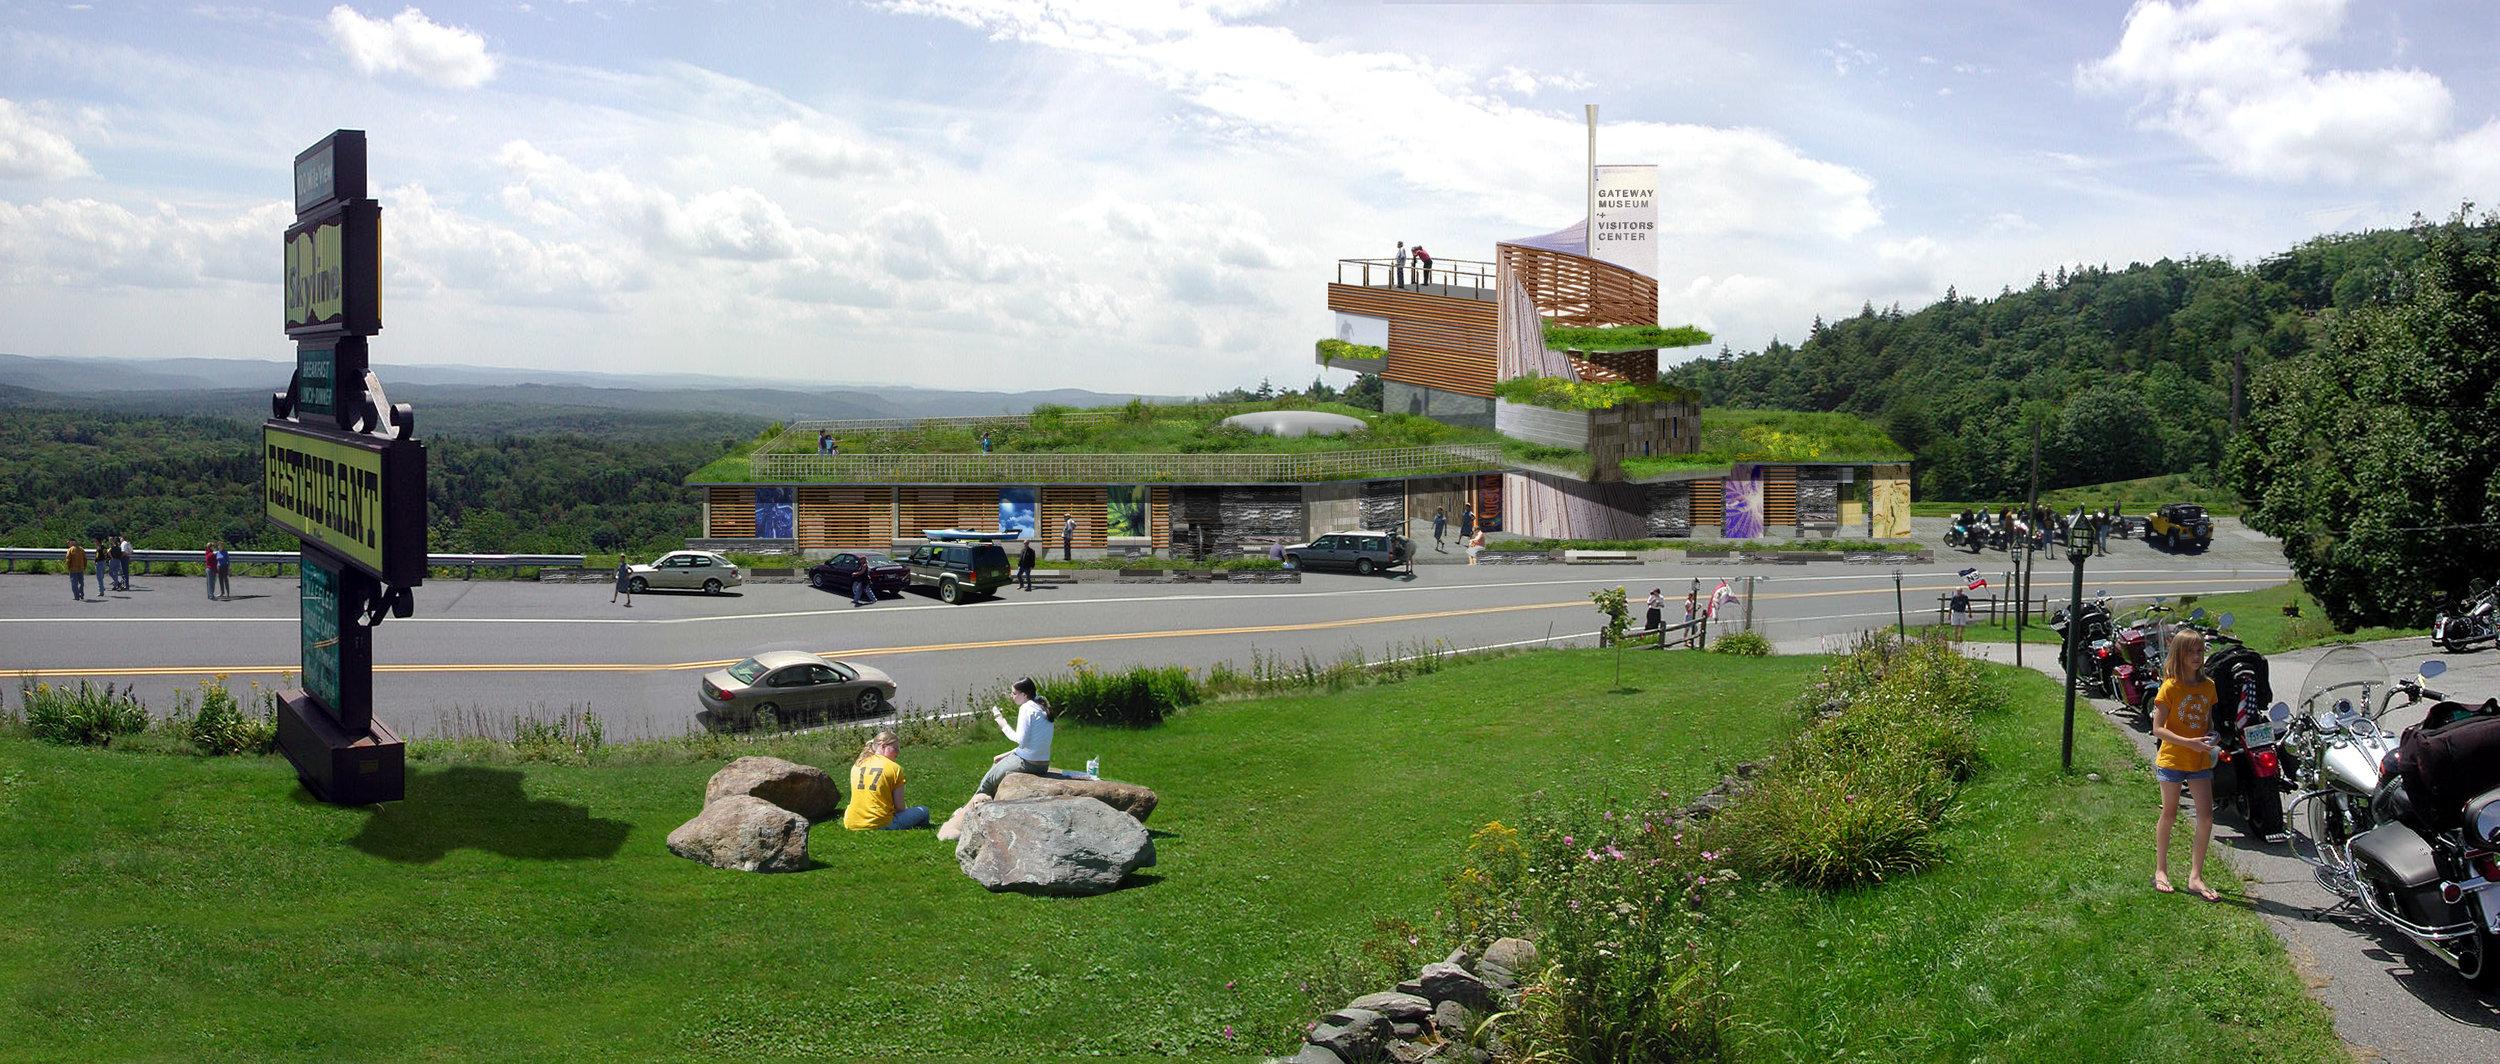 Panoramic2-7.jpg